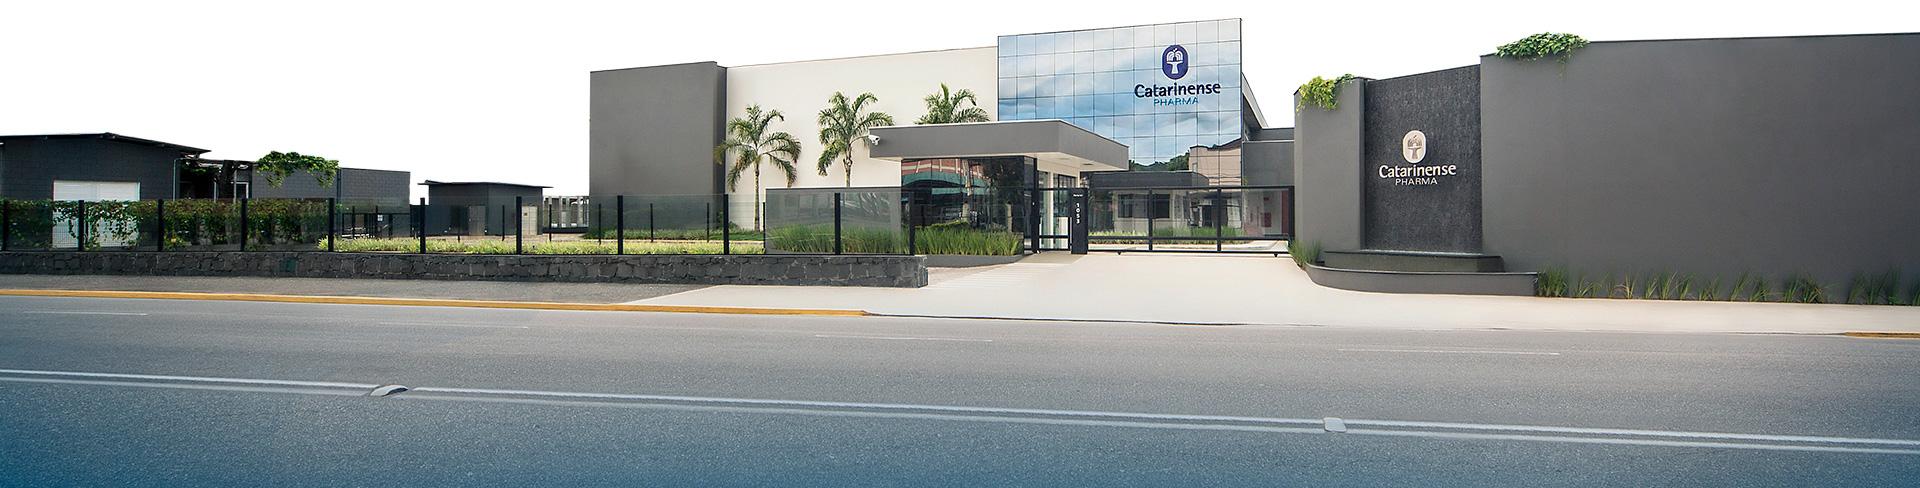 Fachada Catarinense Pharma, Matriz de Joinville